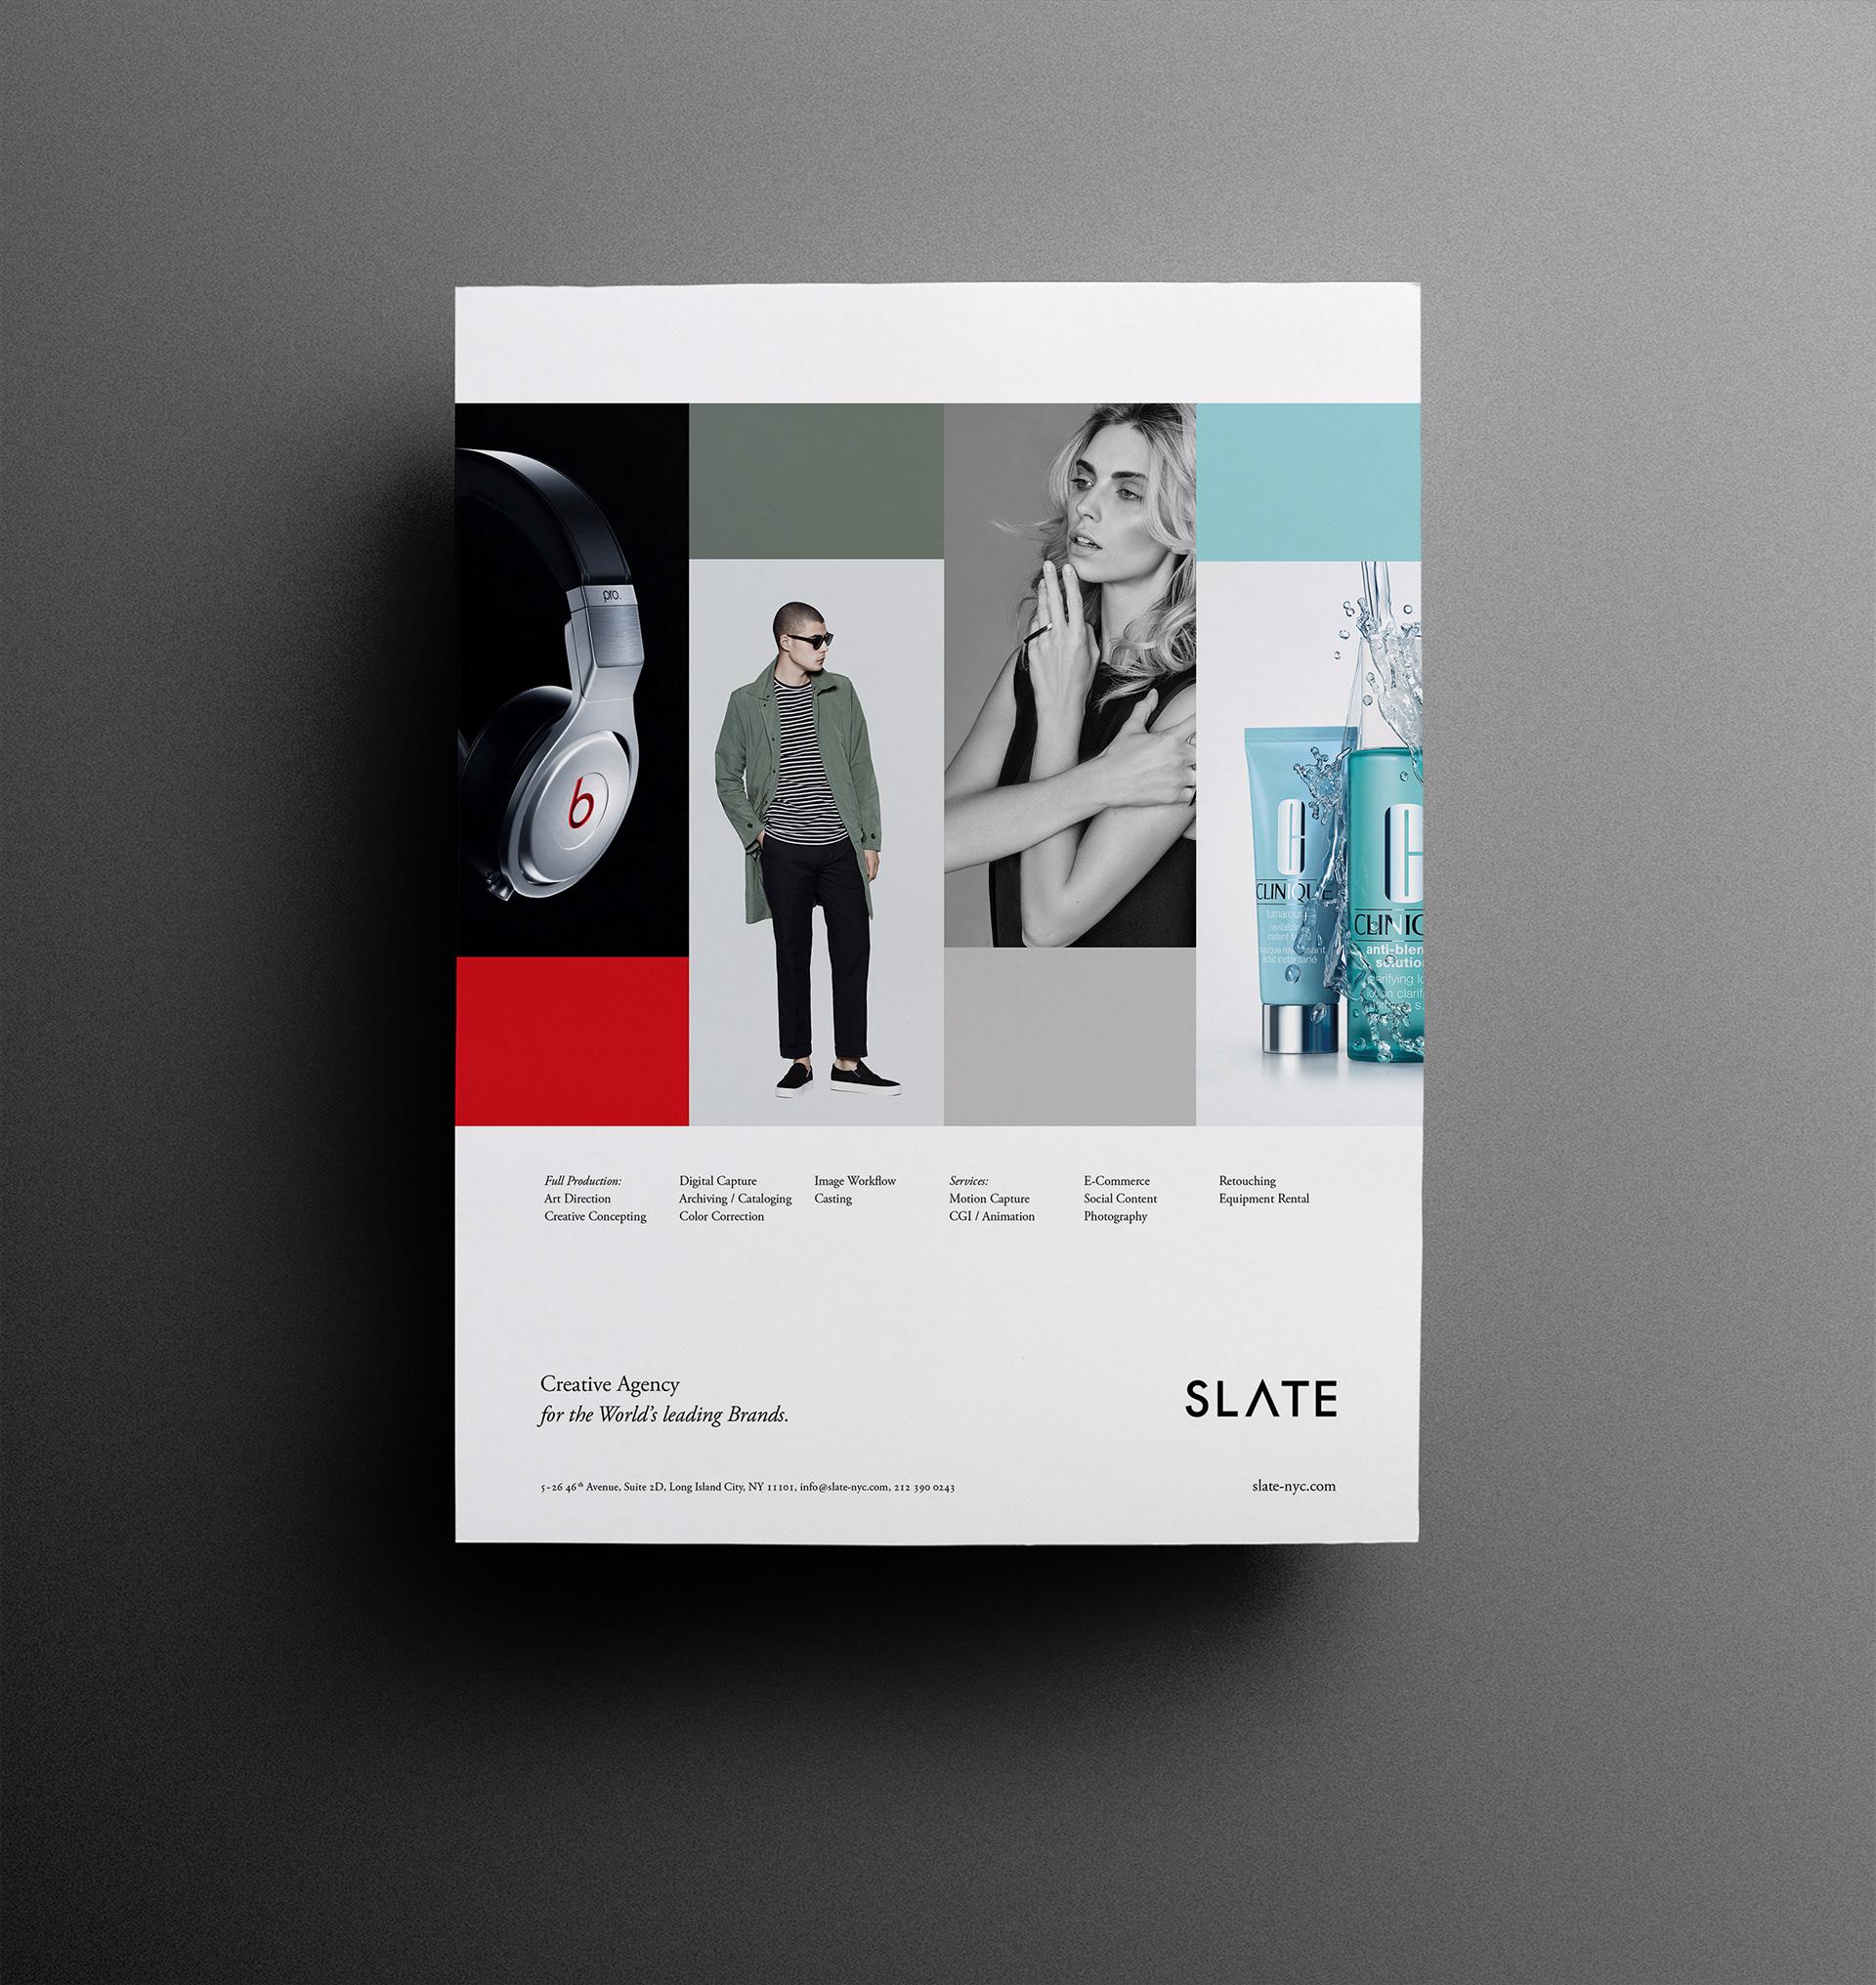 Christoph Ruprecht - Slate Studios NYC